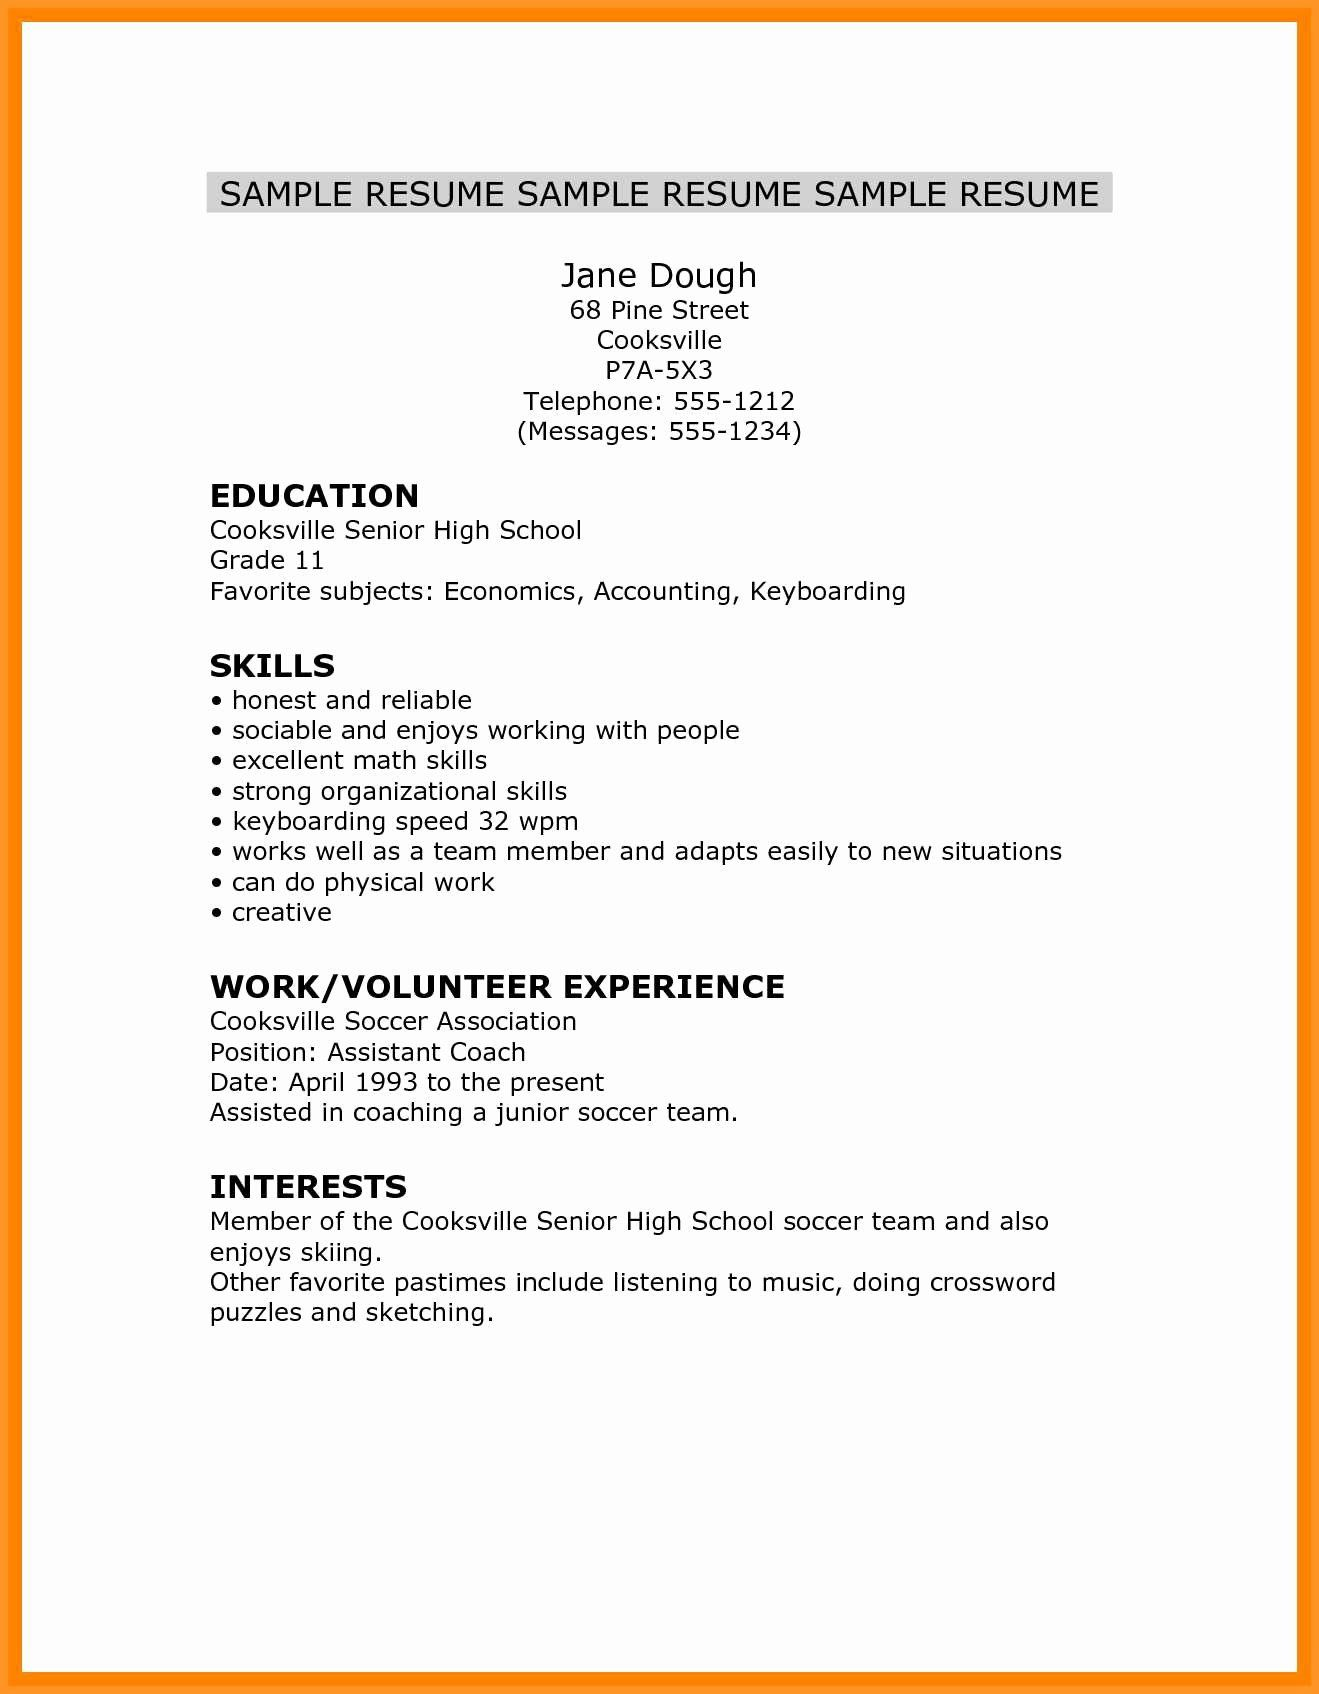 Resume High School Student Fresh 14 15 High School Student Resume Skills High School Resume High School Students Resume Skills